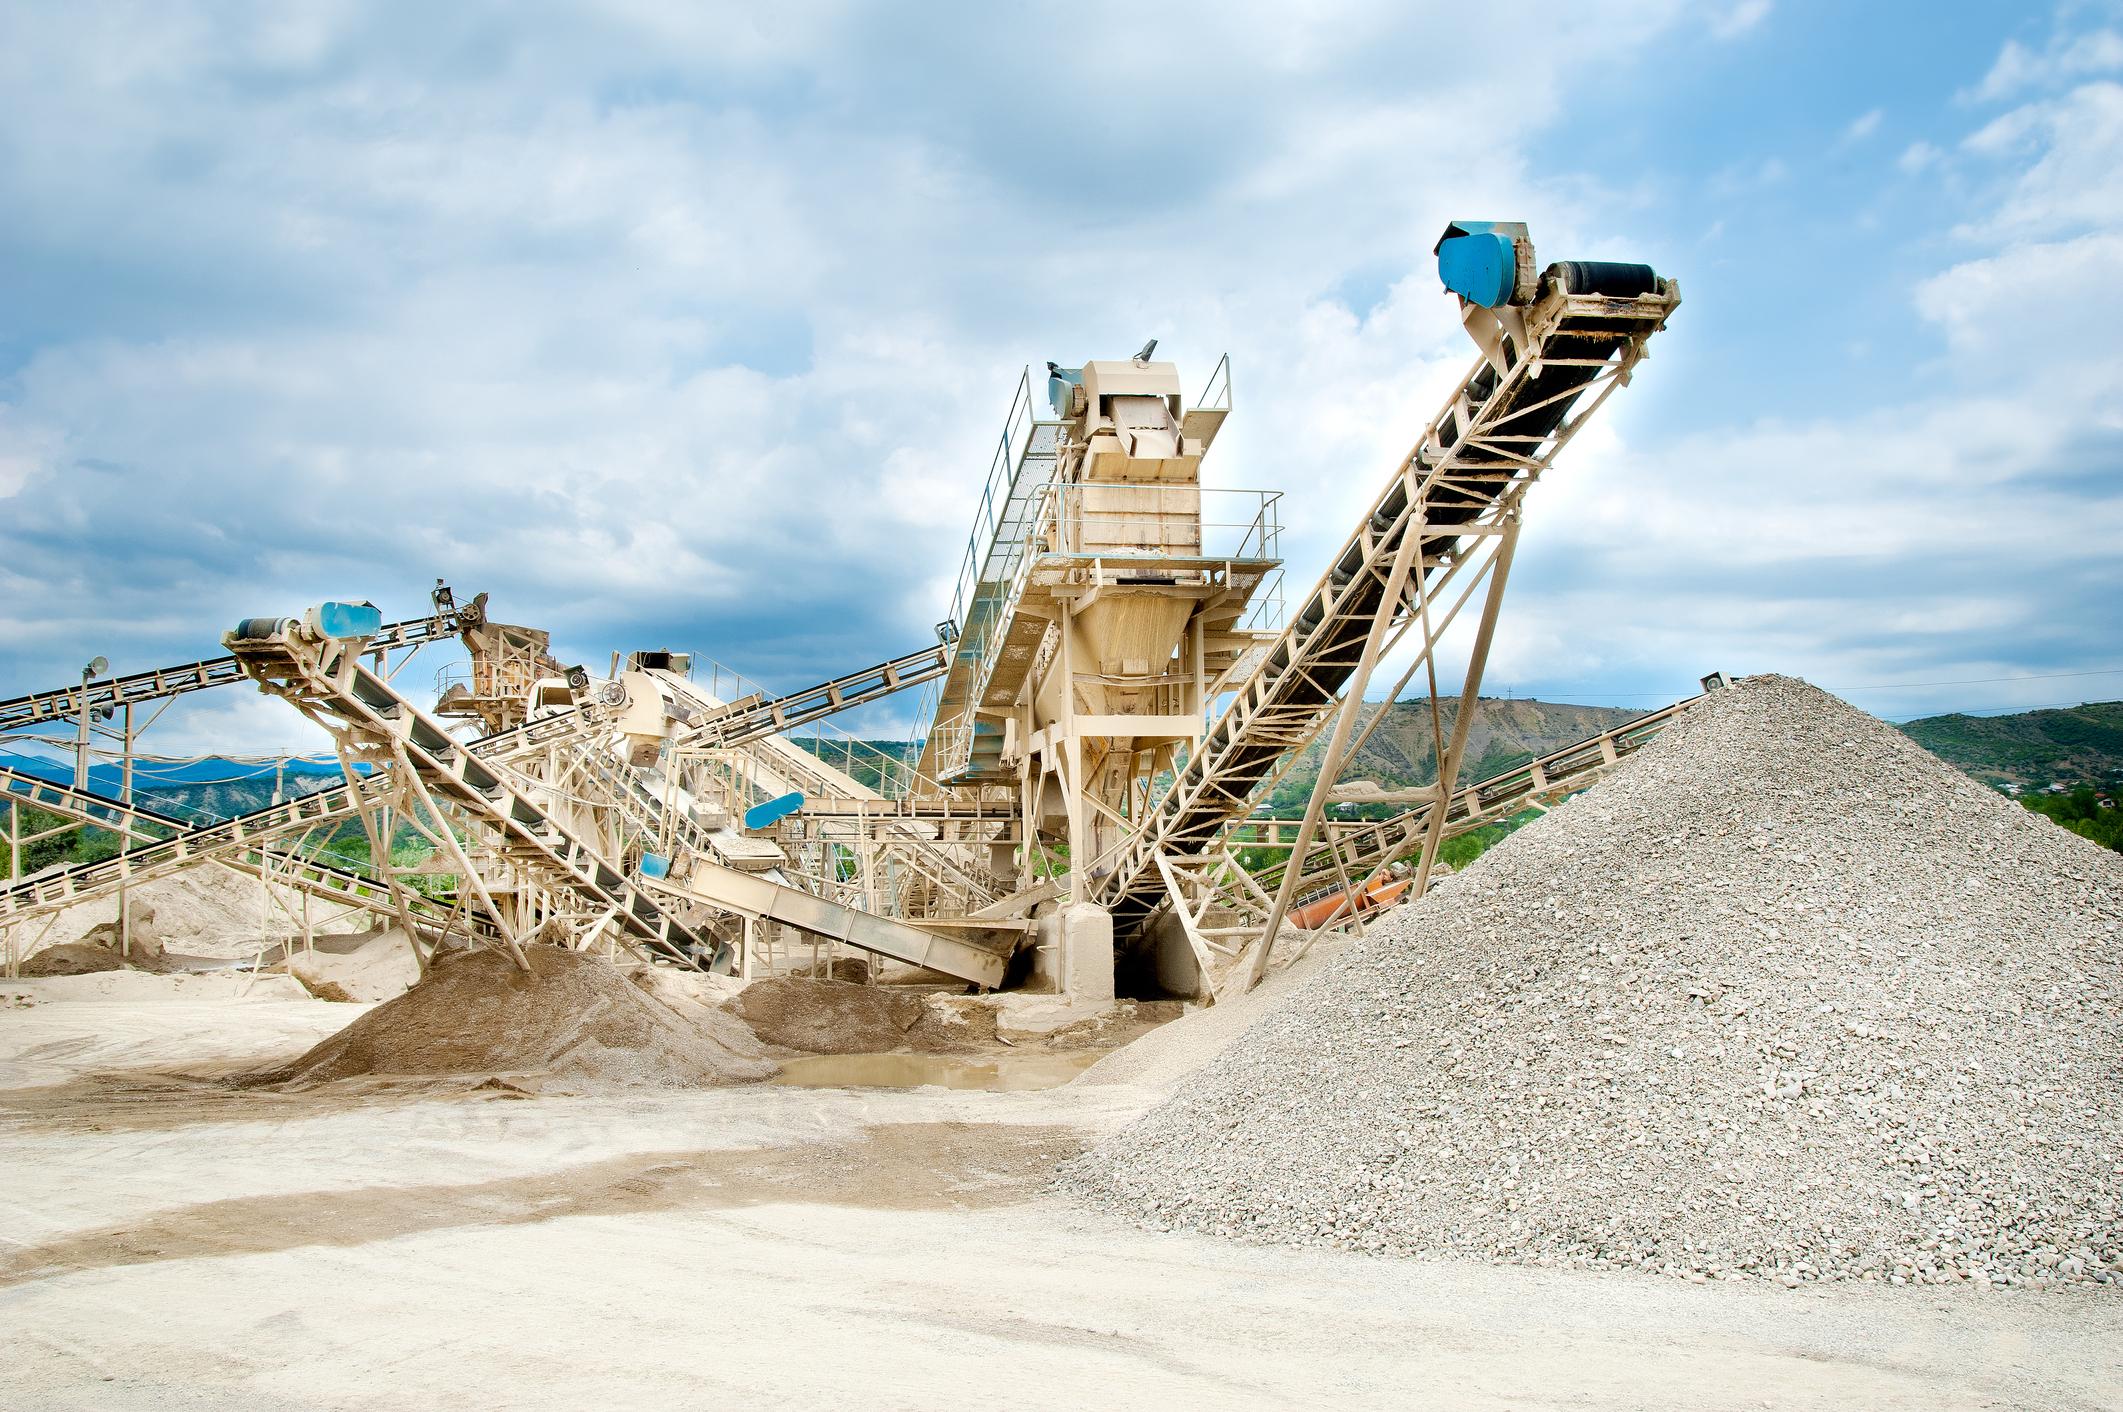 Sand mining equipment.